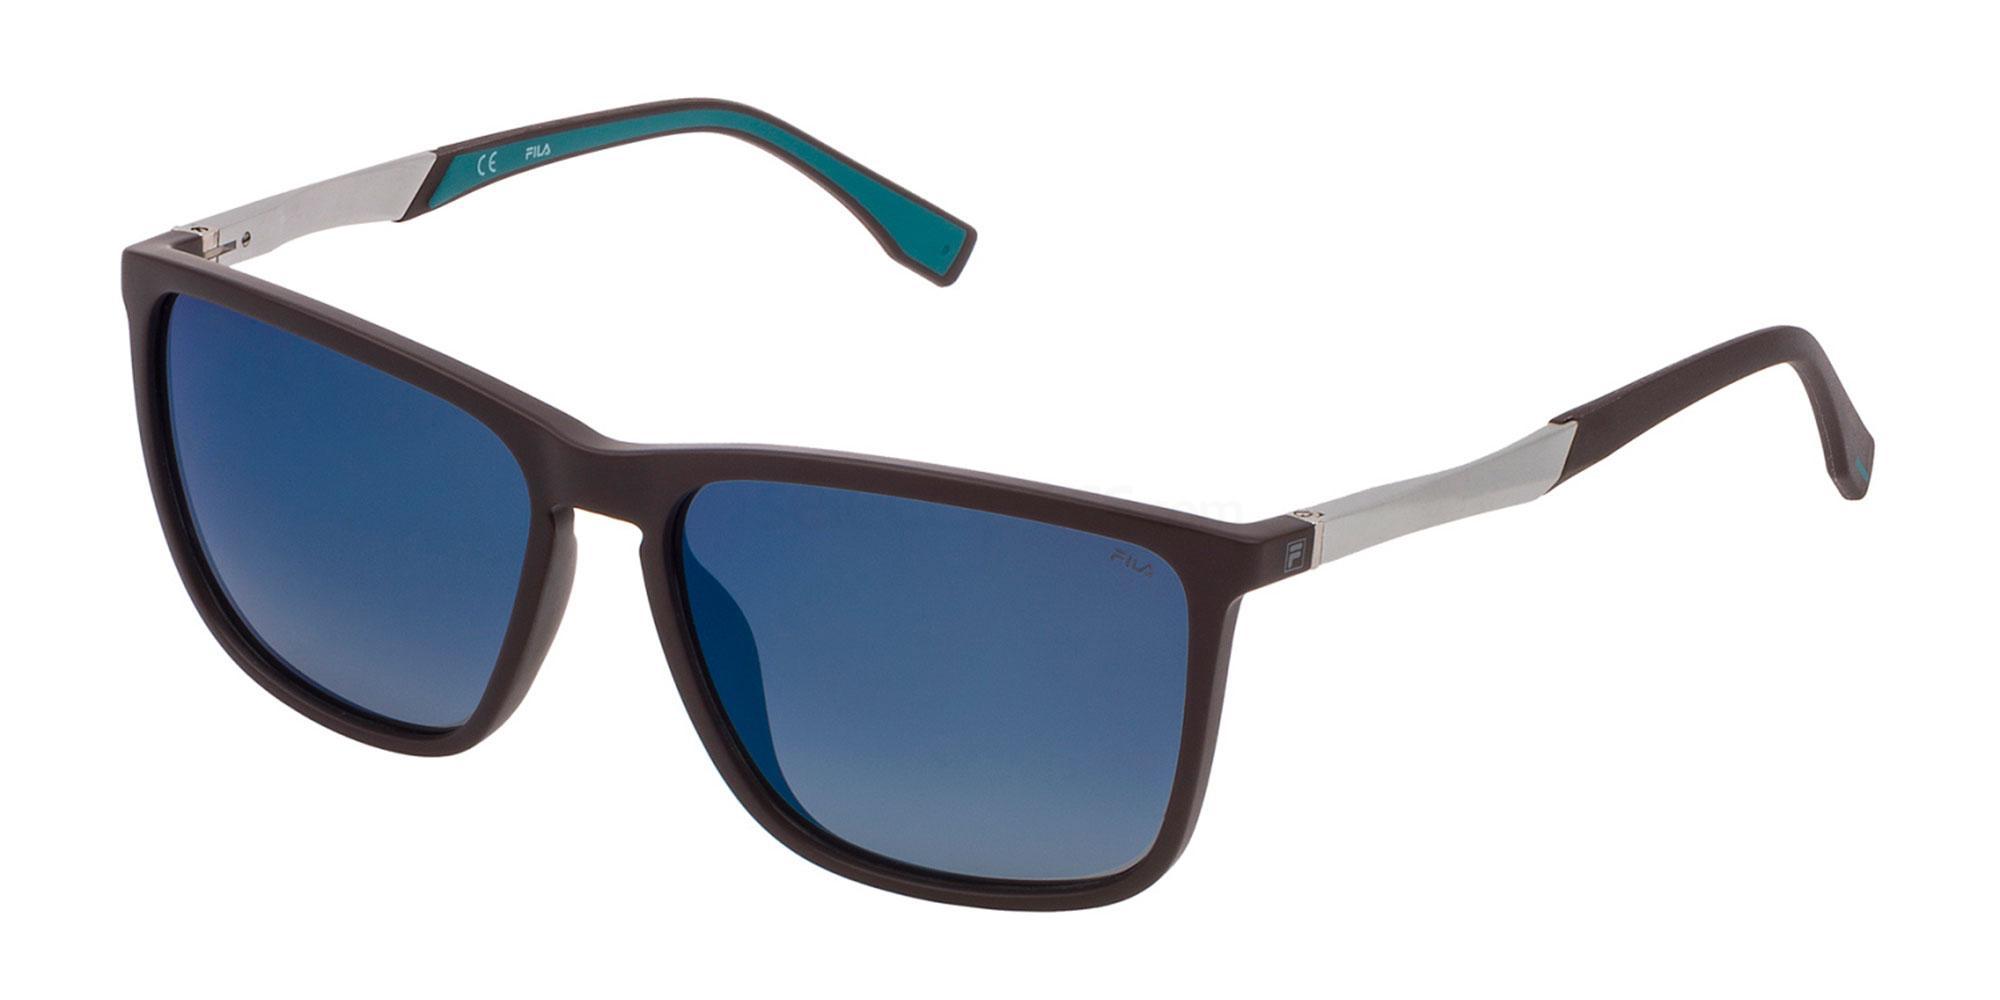 6XKB SF9248 Sunglasses, Fila